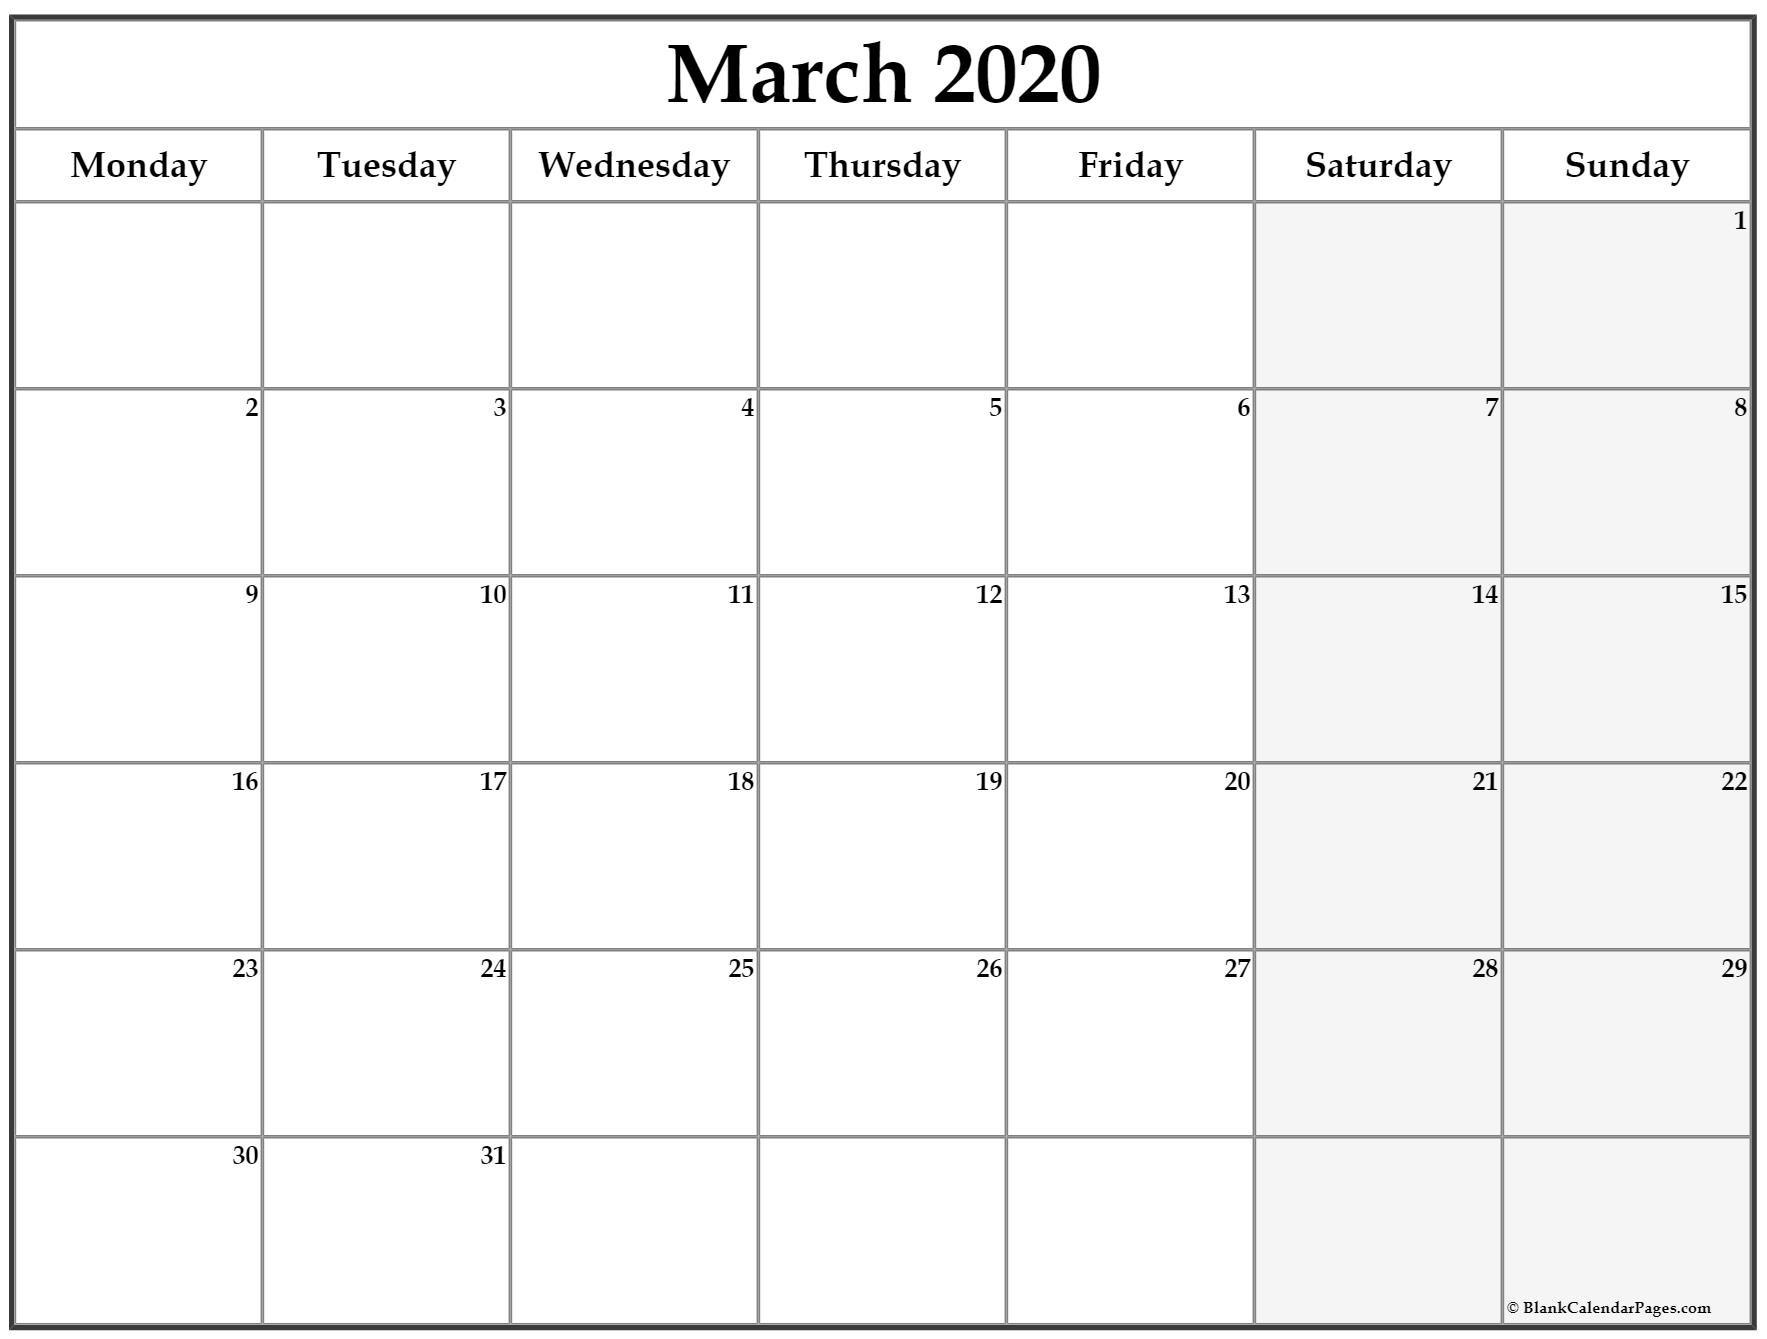 March 2020 Monday Calendar | Monday To Sunday Blank Monday Through Friday Month Calendar Template